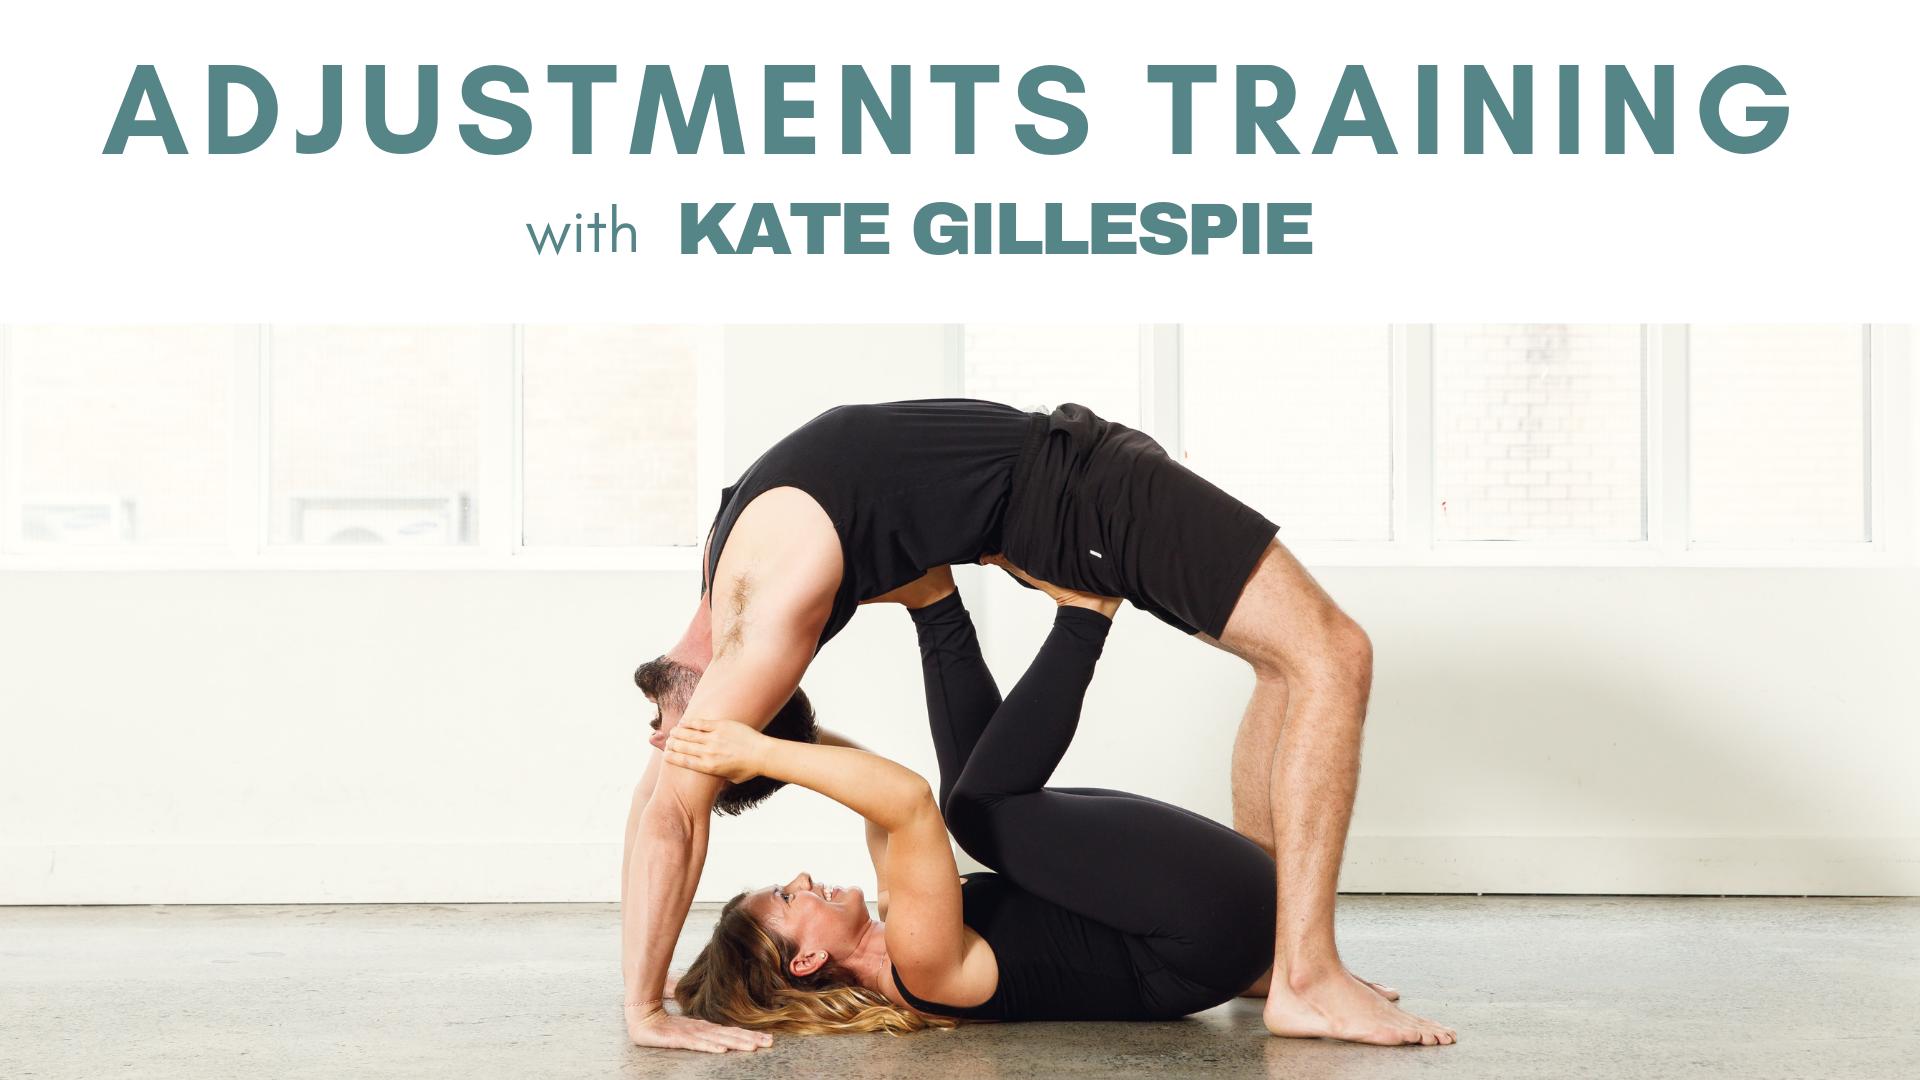 adjustments-training-banner-5c40e620639cf.png